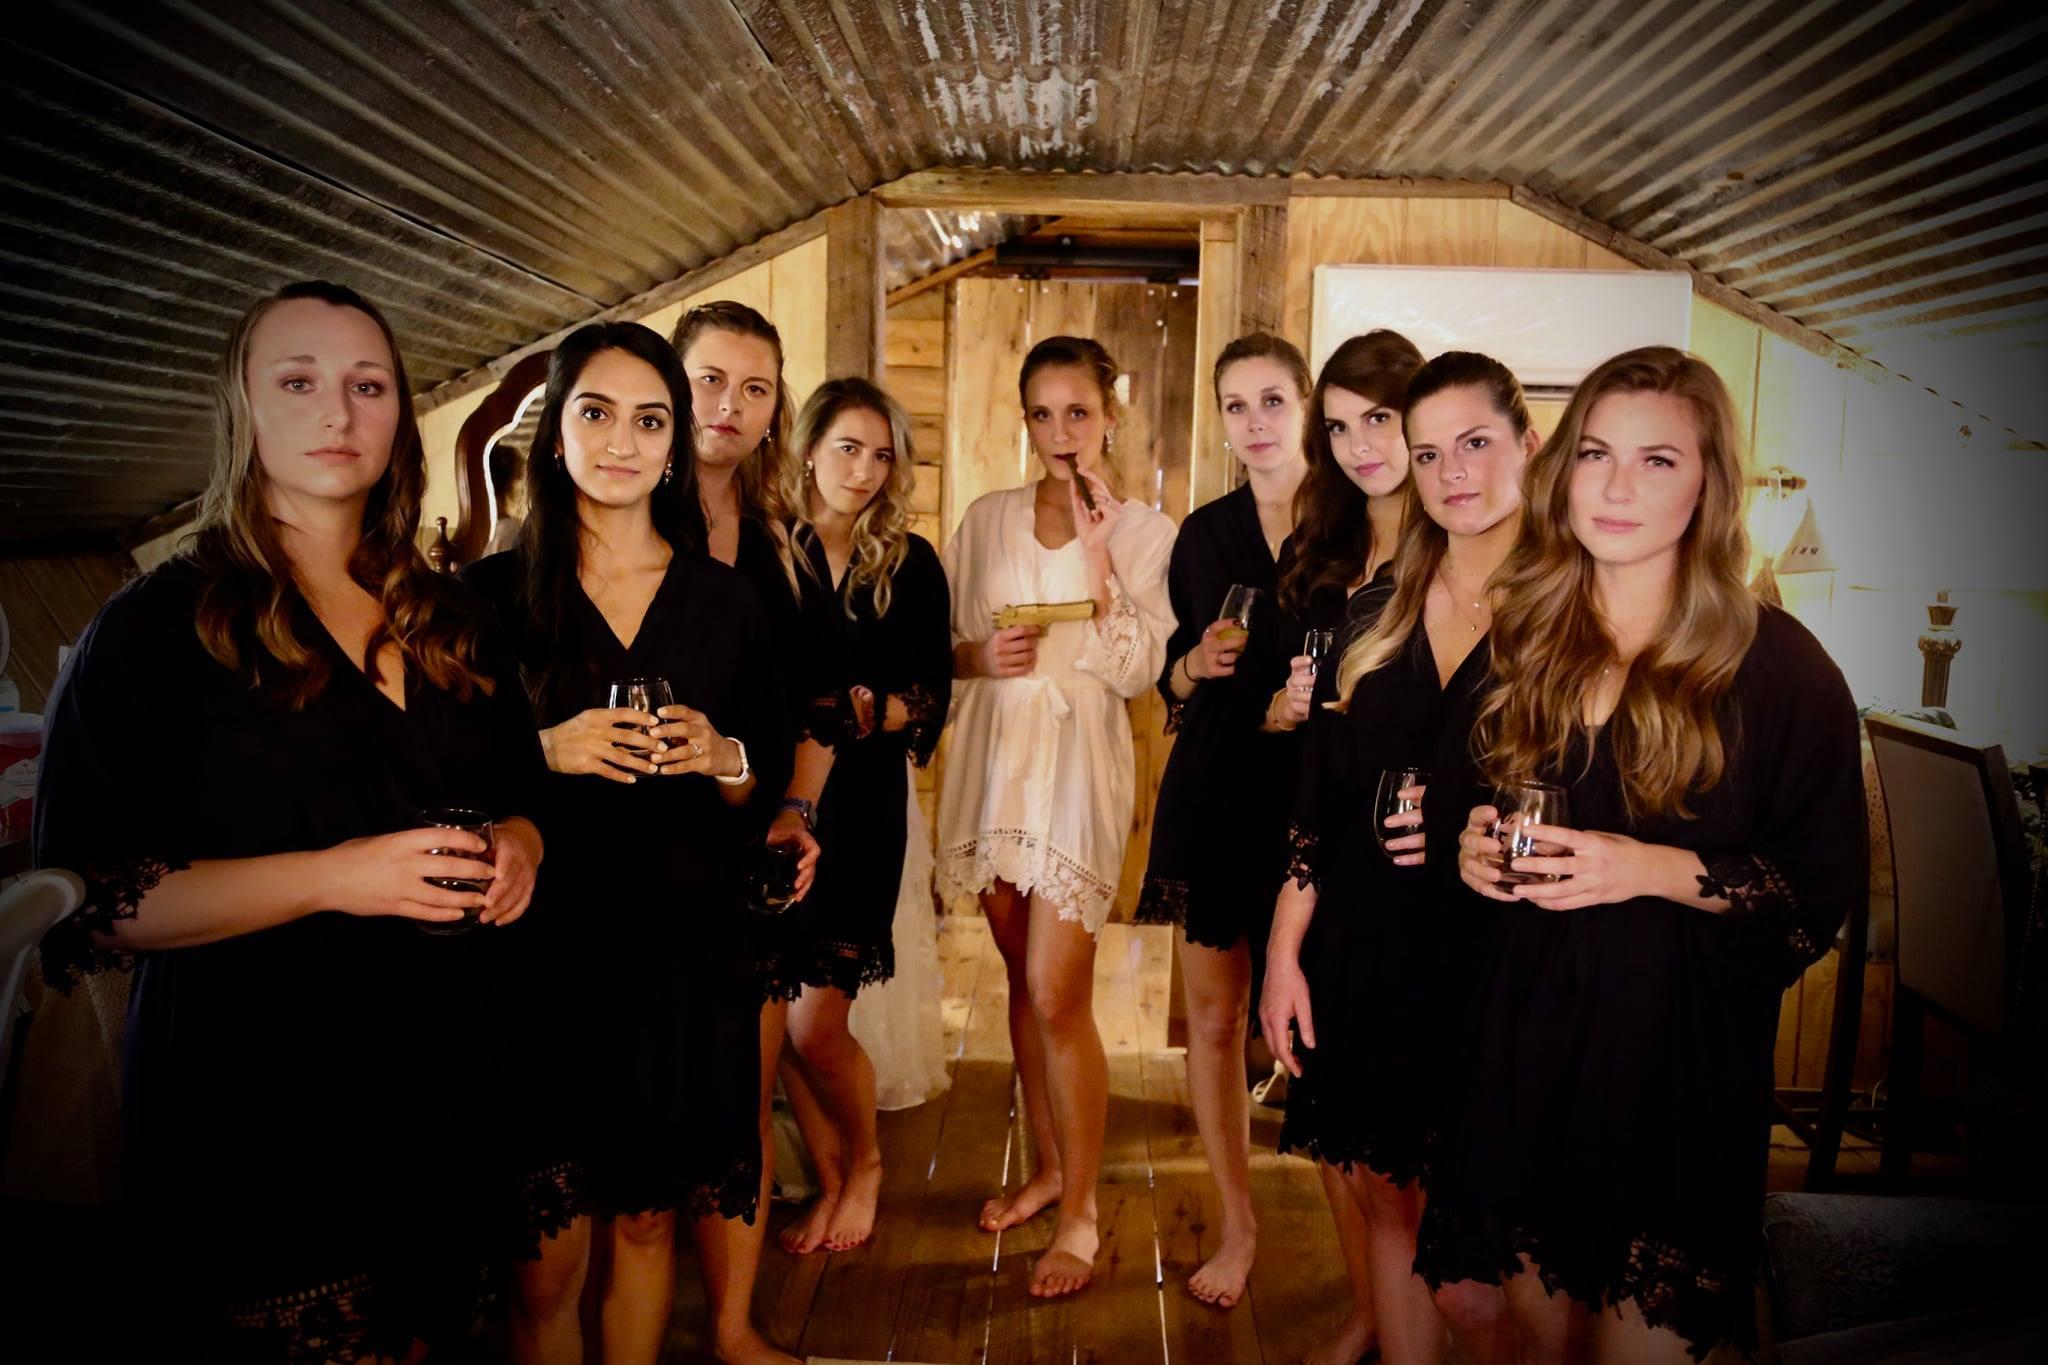 cigar bar at wedding, wedding gift for groom, groom and bride, bridesmaids and groomsmen cigar party